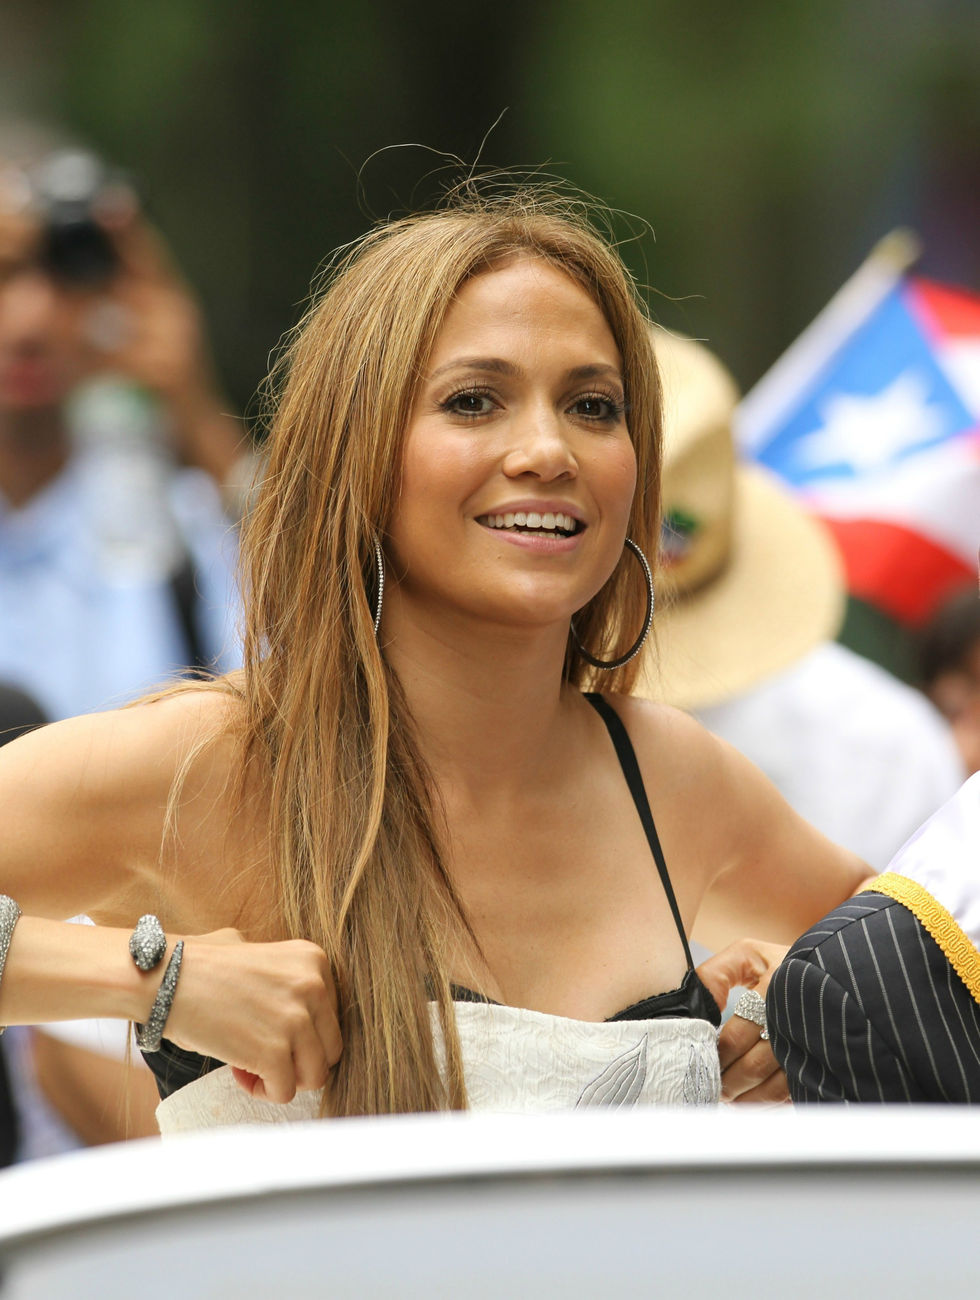 Jennifer Lopez 2010 : jennifer-lopez-at-puerto-rican-day-parade-jun-2010-05